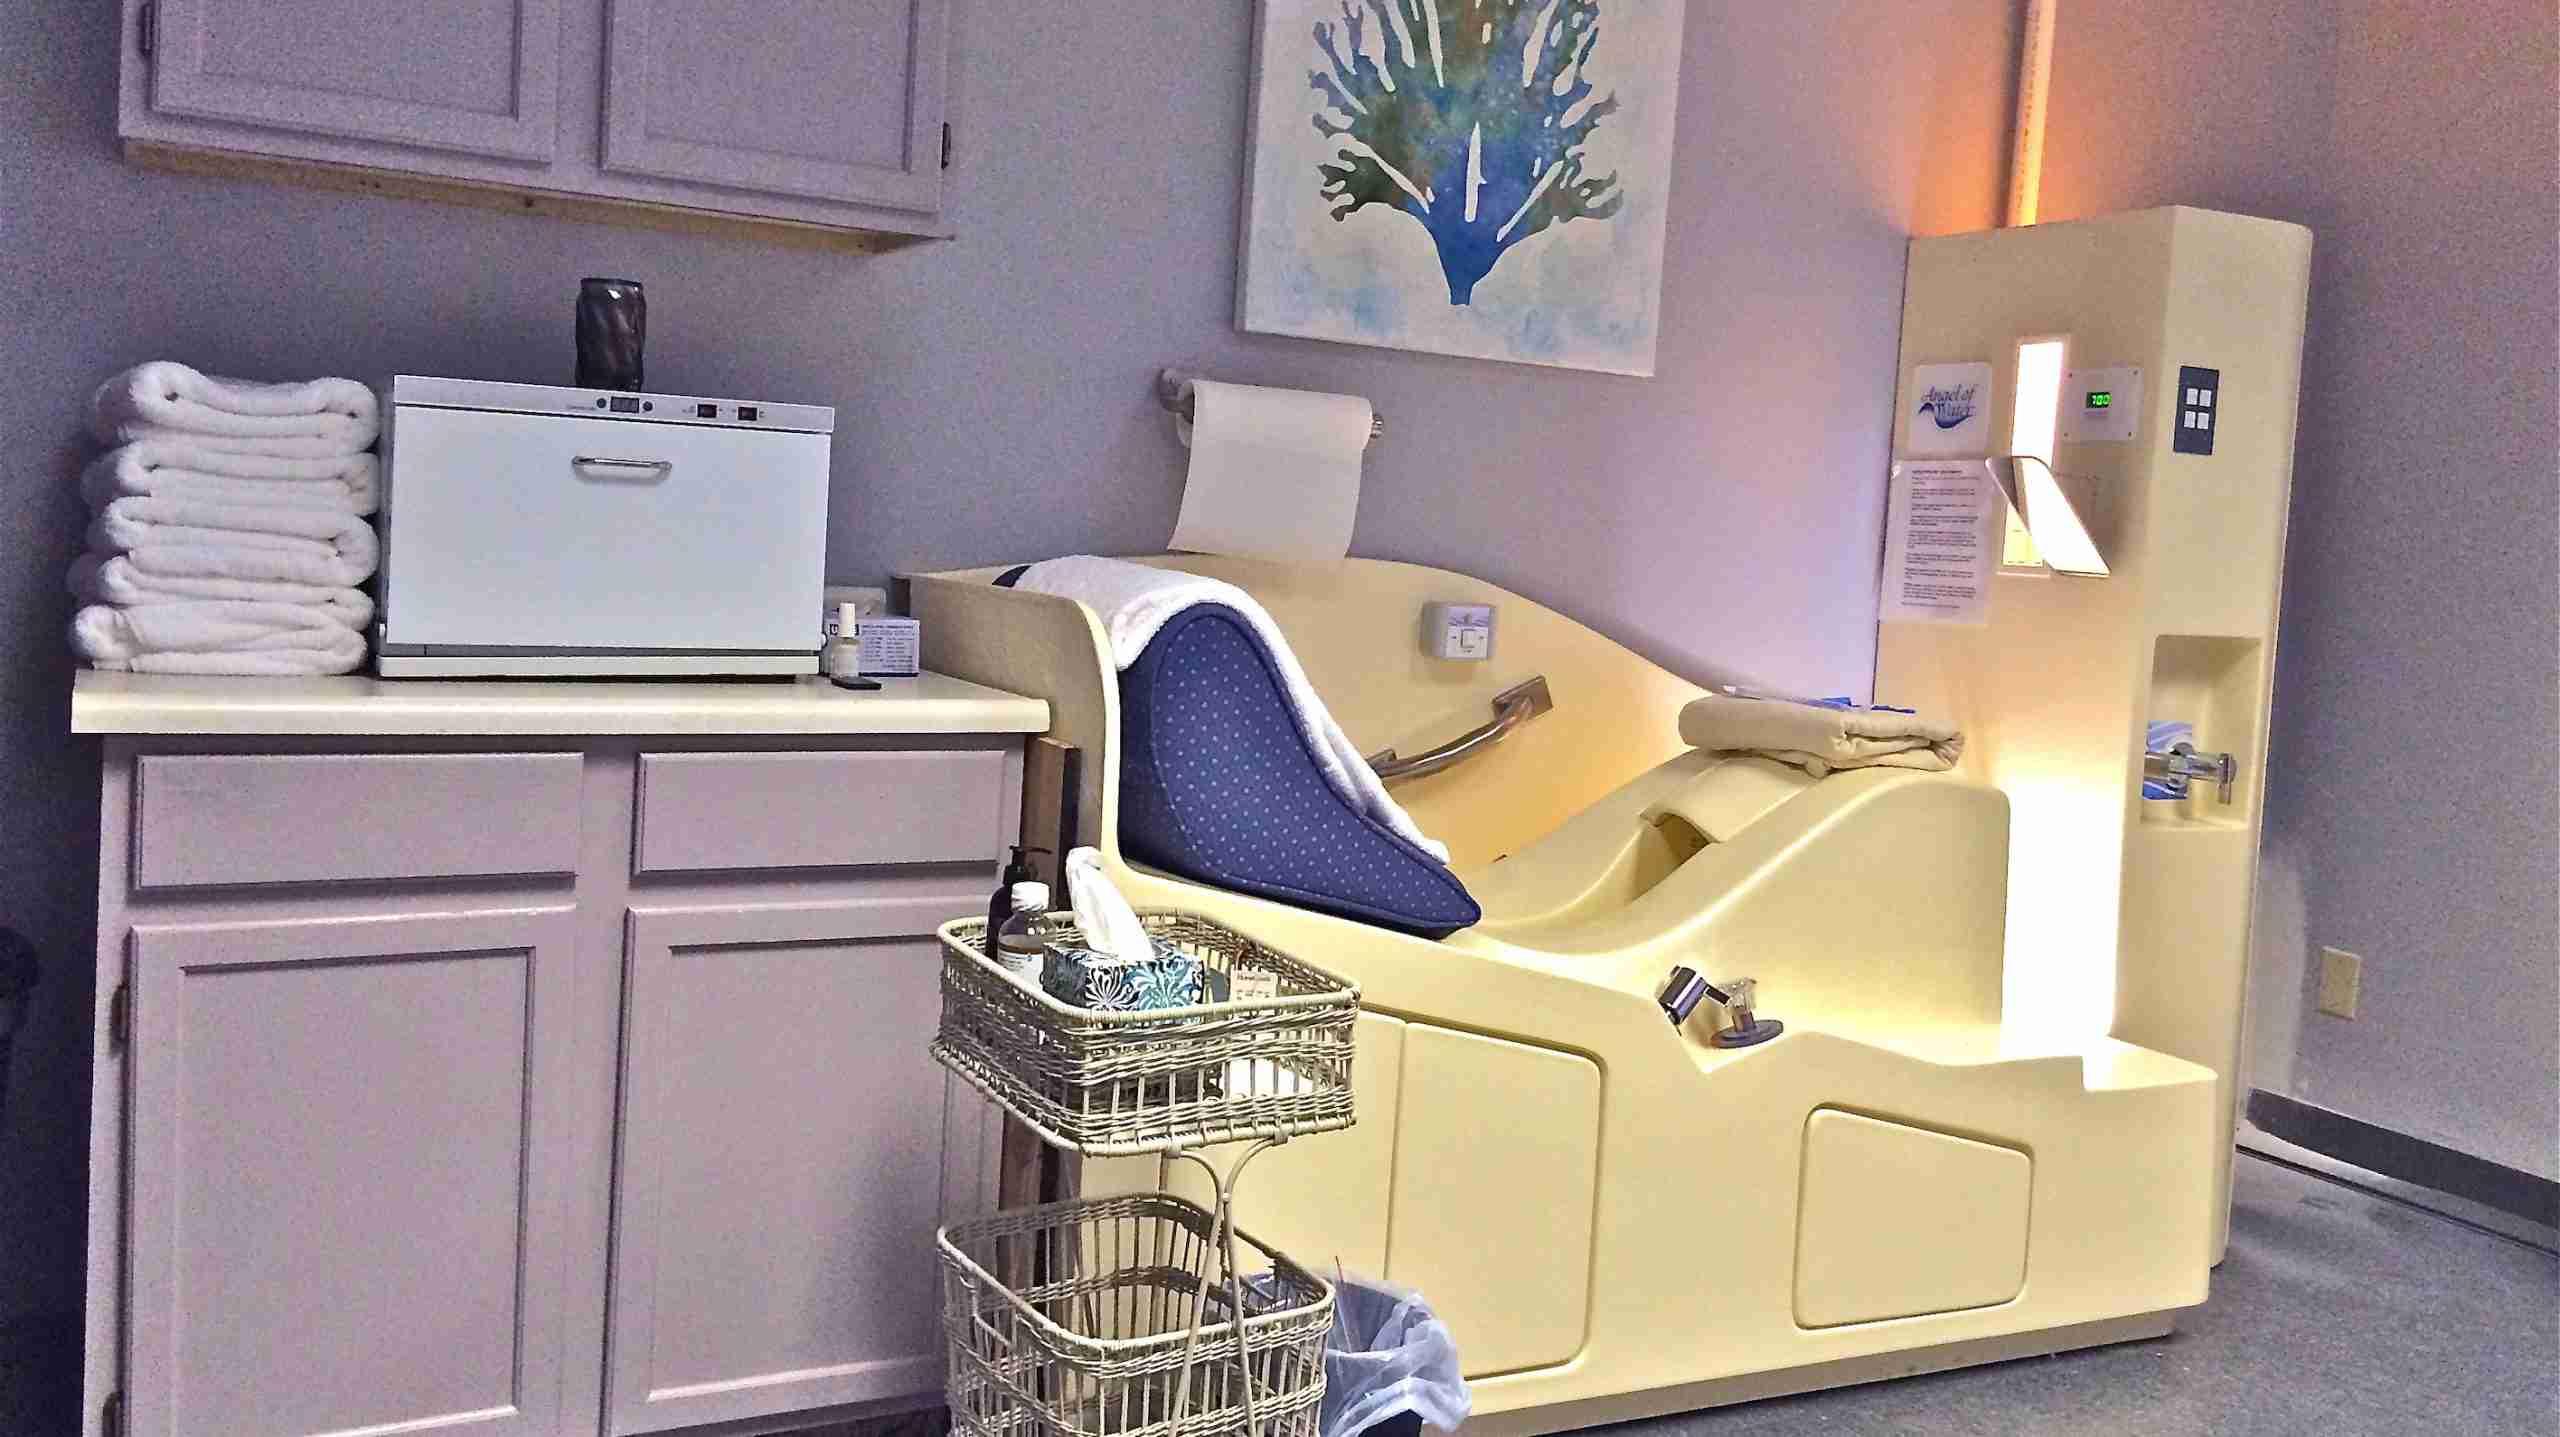 Colon Hydrotherapy Center in Scottsdale, Arizona for Alternative Cancer Treatment